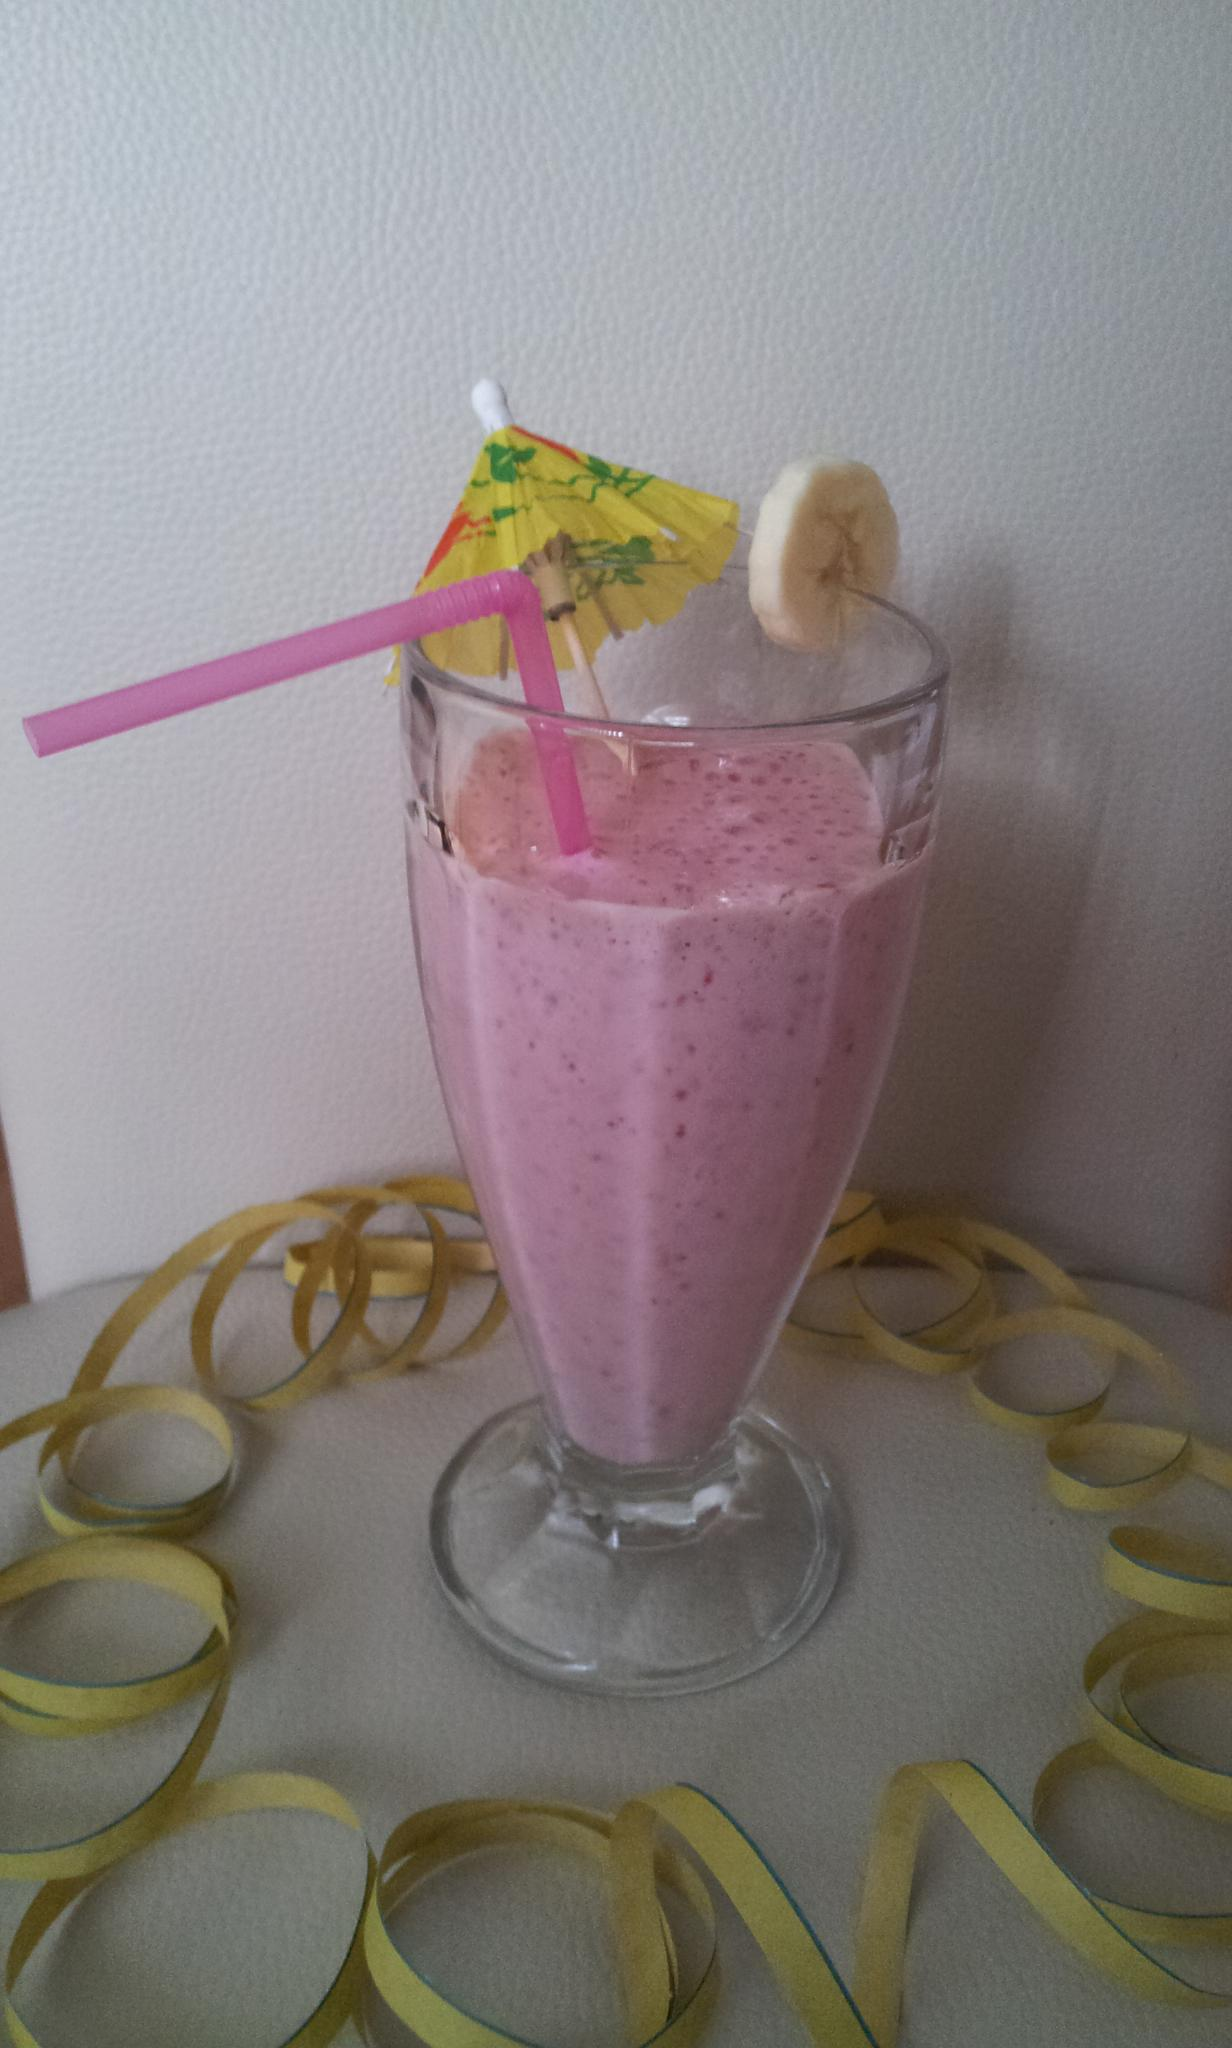 http://foodloader.net/Holz_2013-08-03_Raspberry_Vanilla_Banana_Shake.jpg